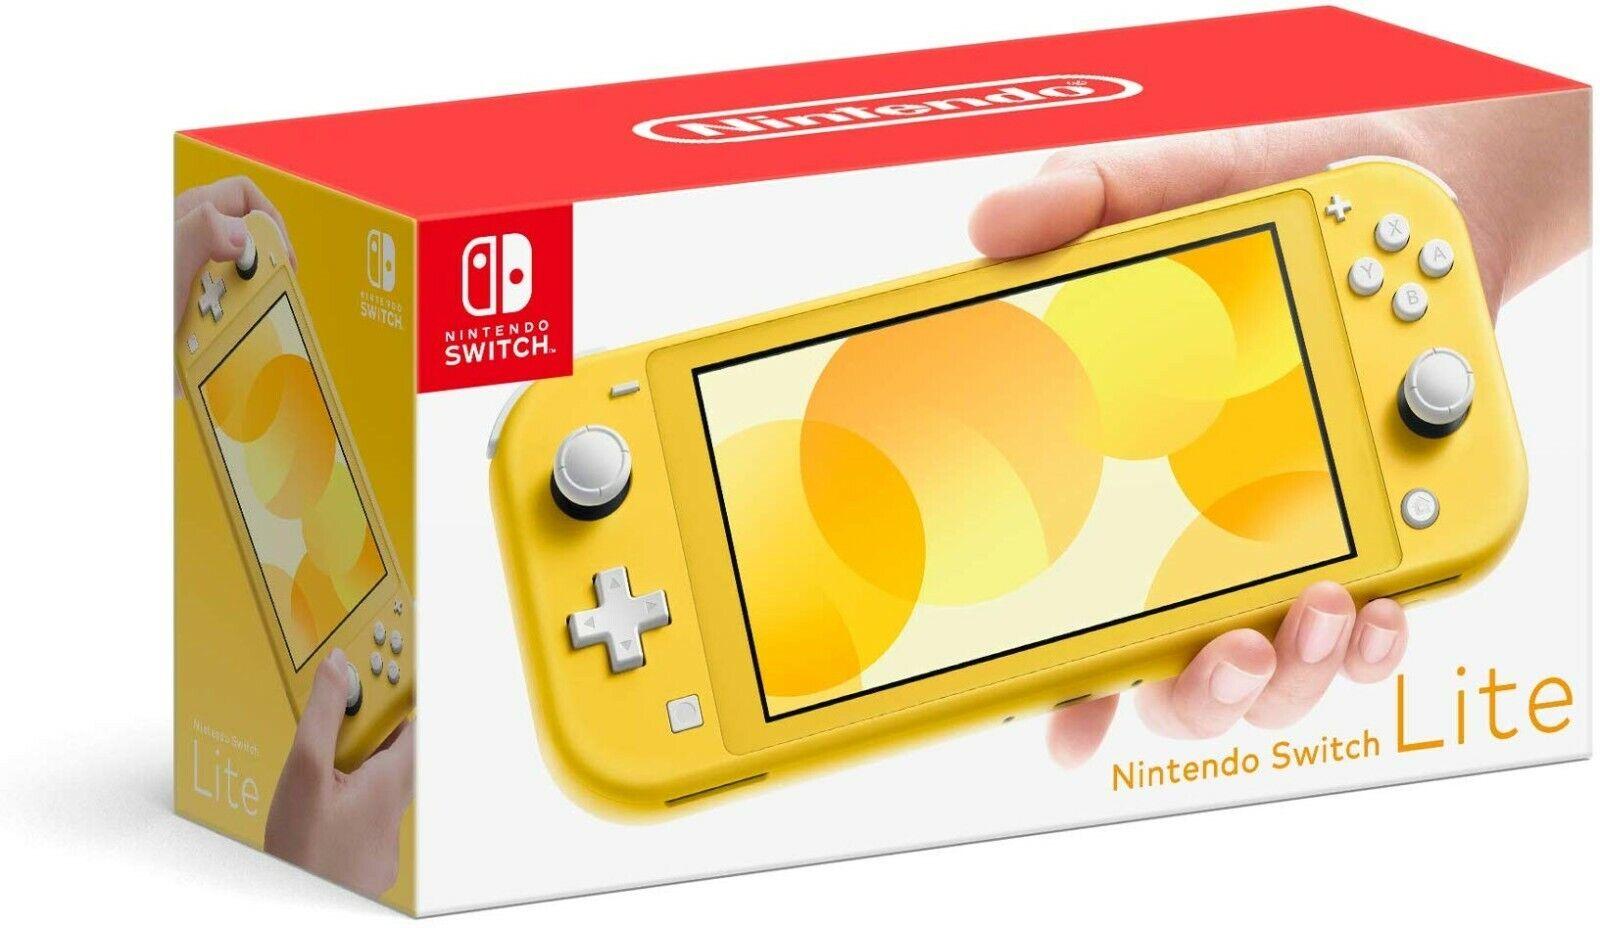 NINTENDO SWITCH LITE Yellow Handheld Video Game Console USA Model ~ BRAND NEW